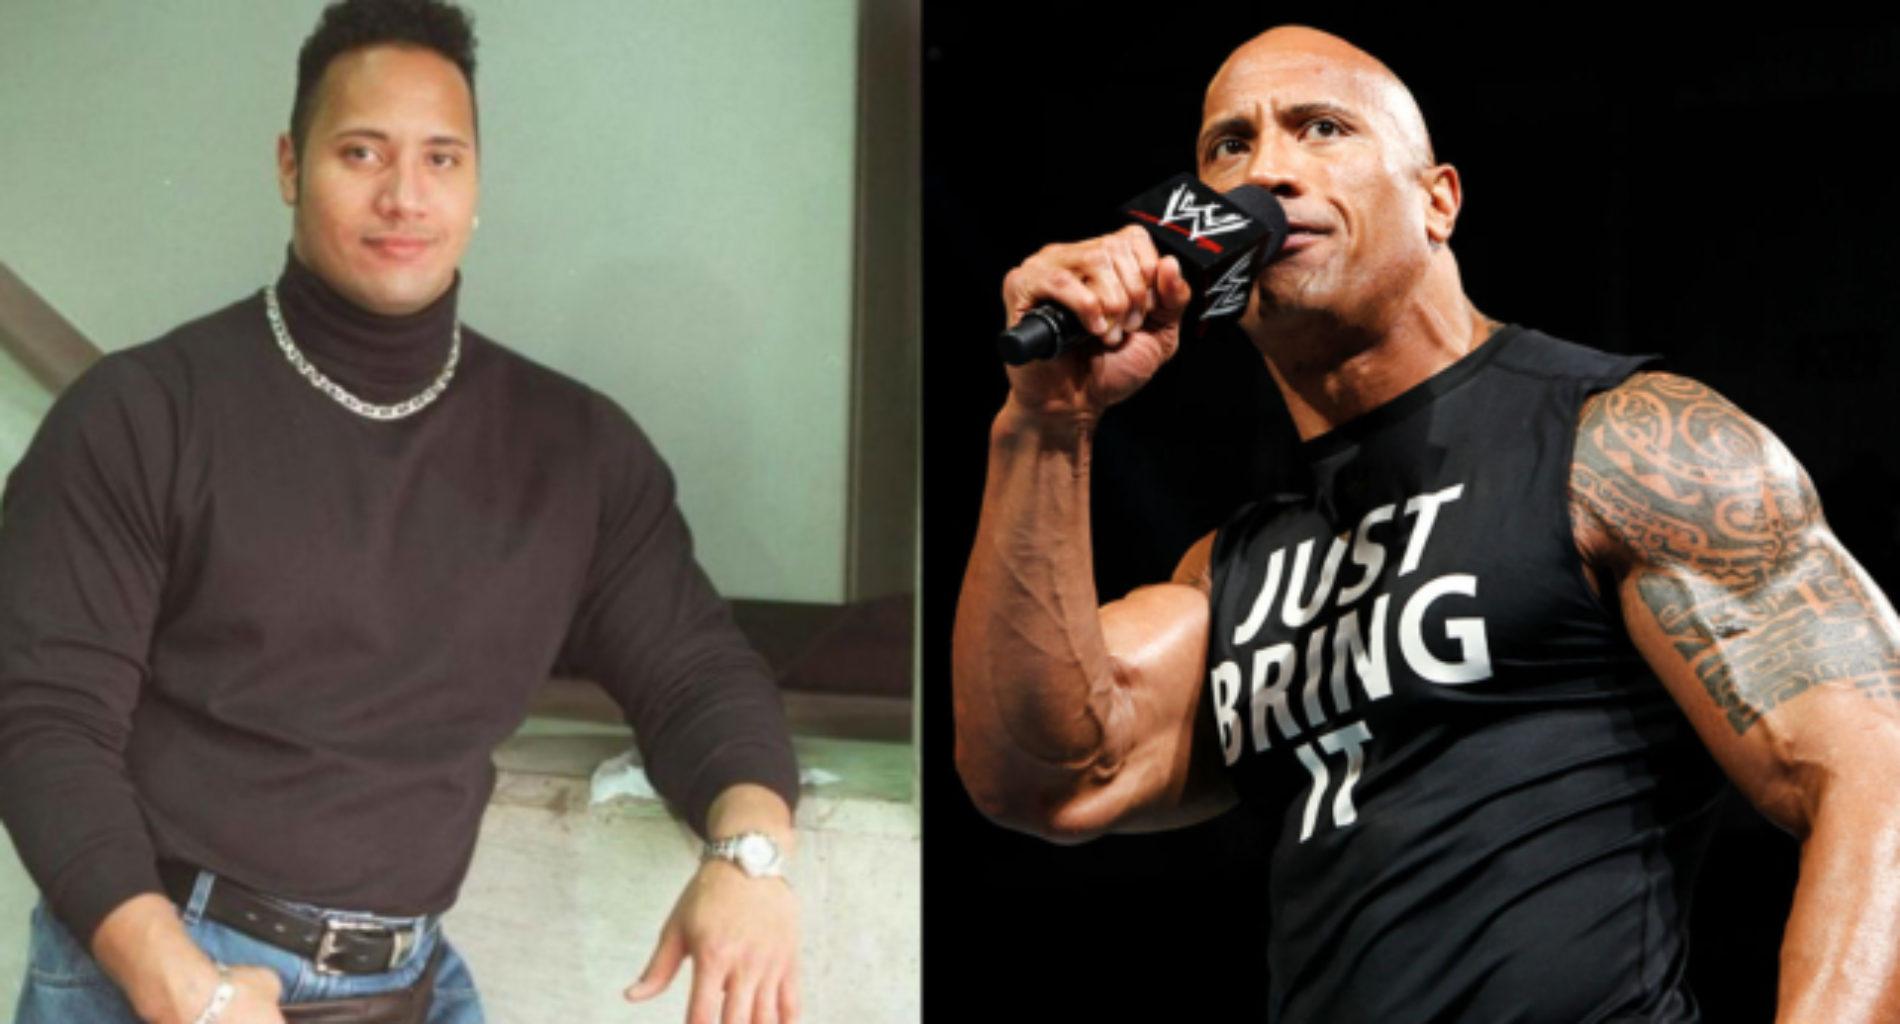 Dwayne 'The Rock' Johnson says he used to look like a buff lesbian